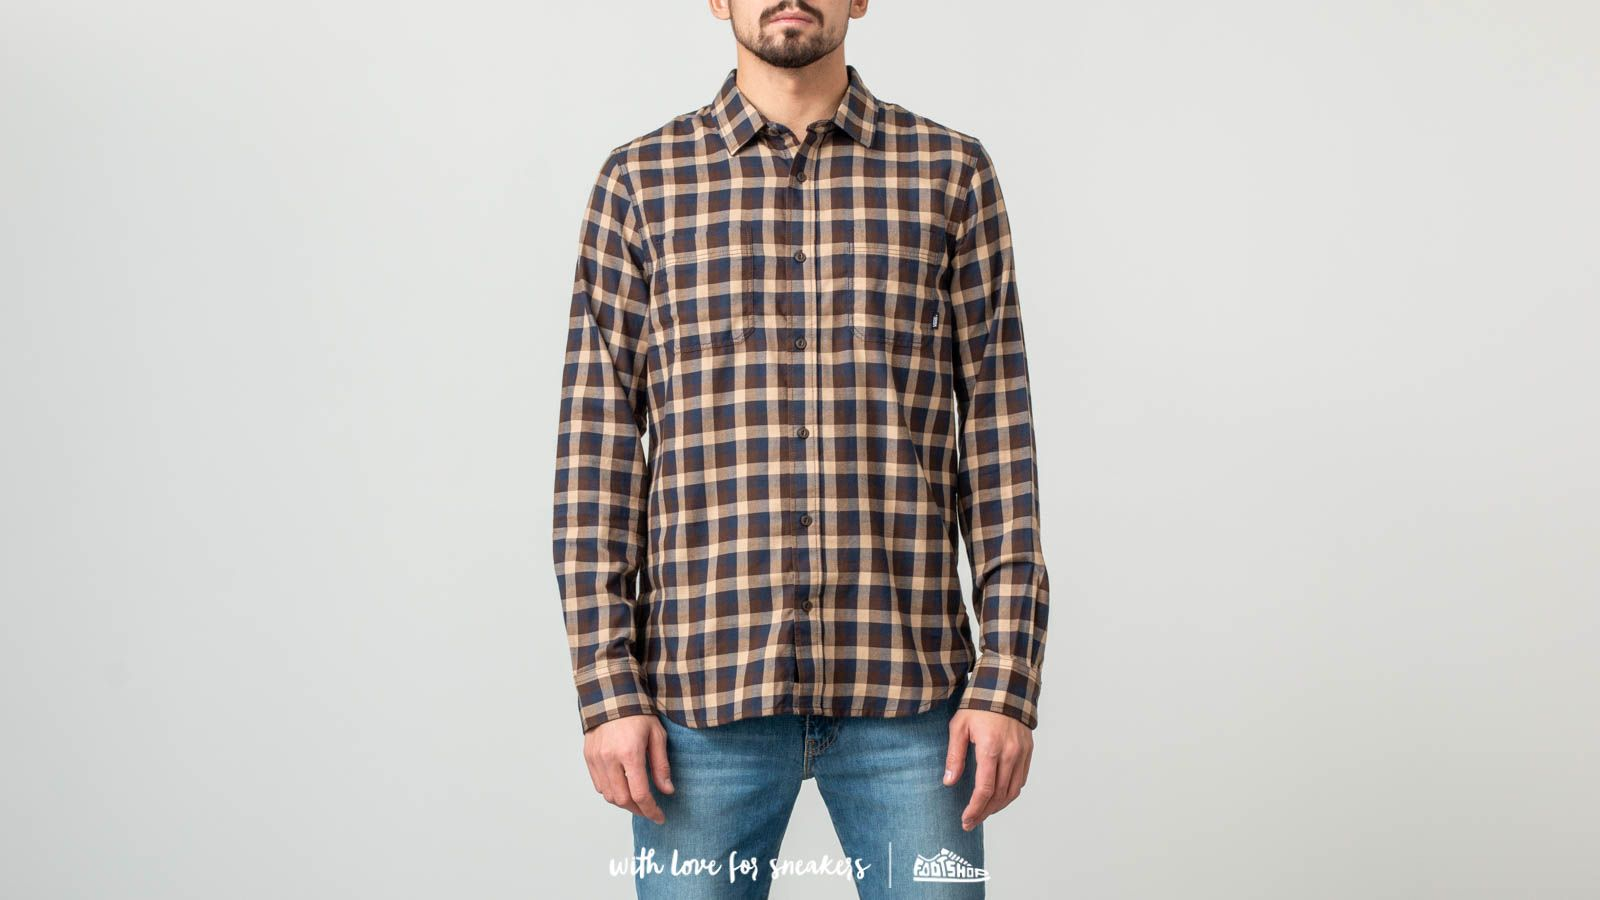 Vans Alameda II Shirt Demitasse-Khaki za skvělou cenu 870 Kč koupíte na Footshop.cz